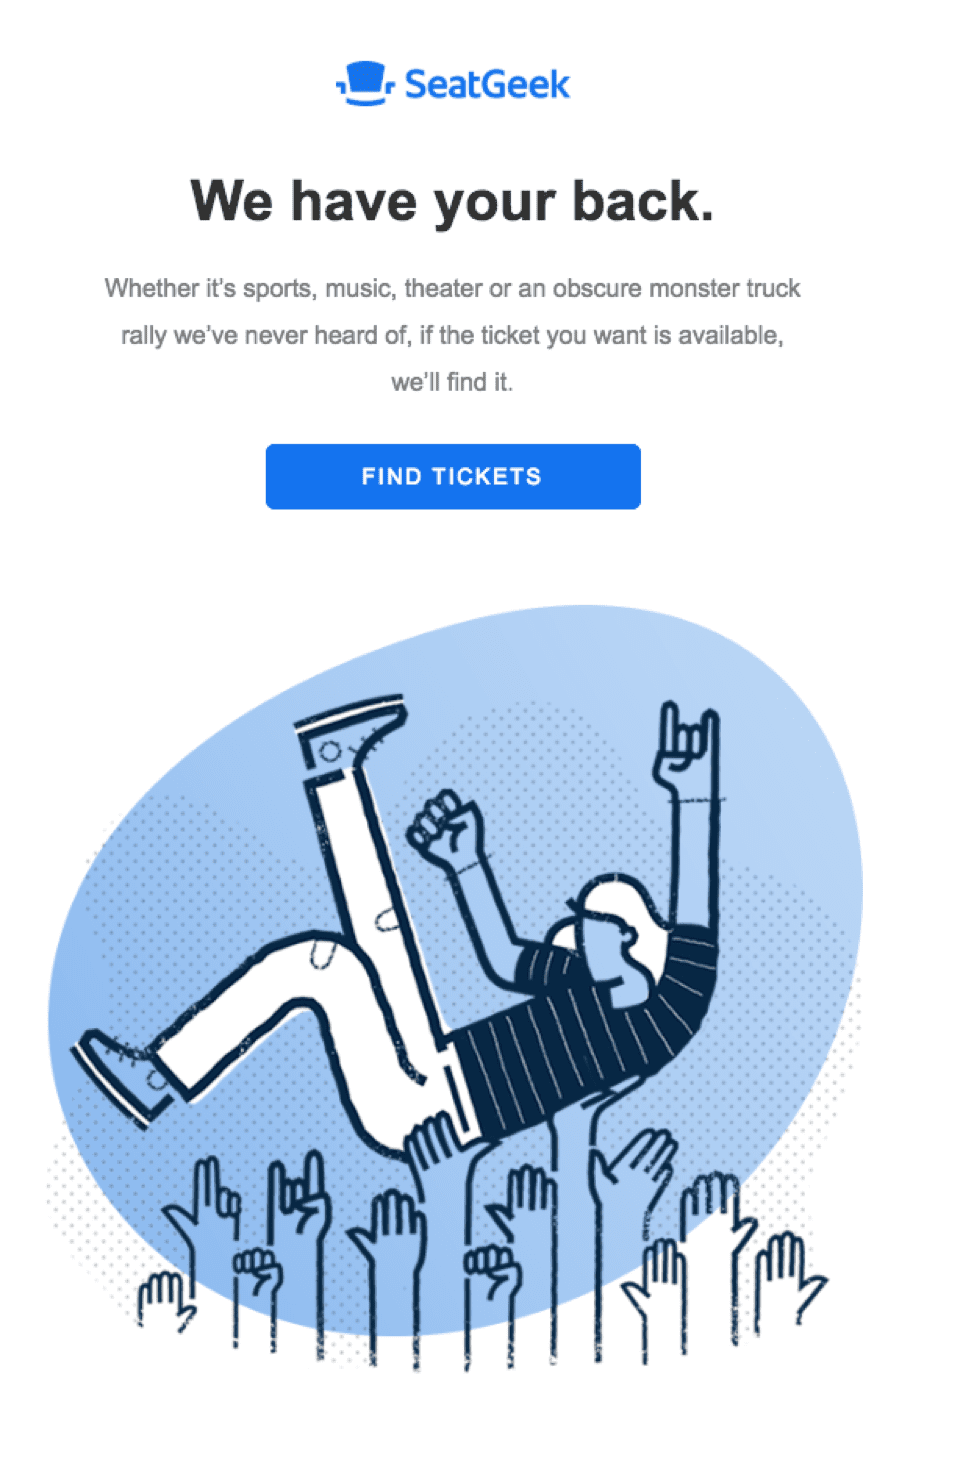 SeatGeek email screenshot